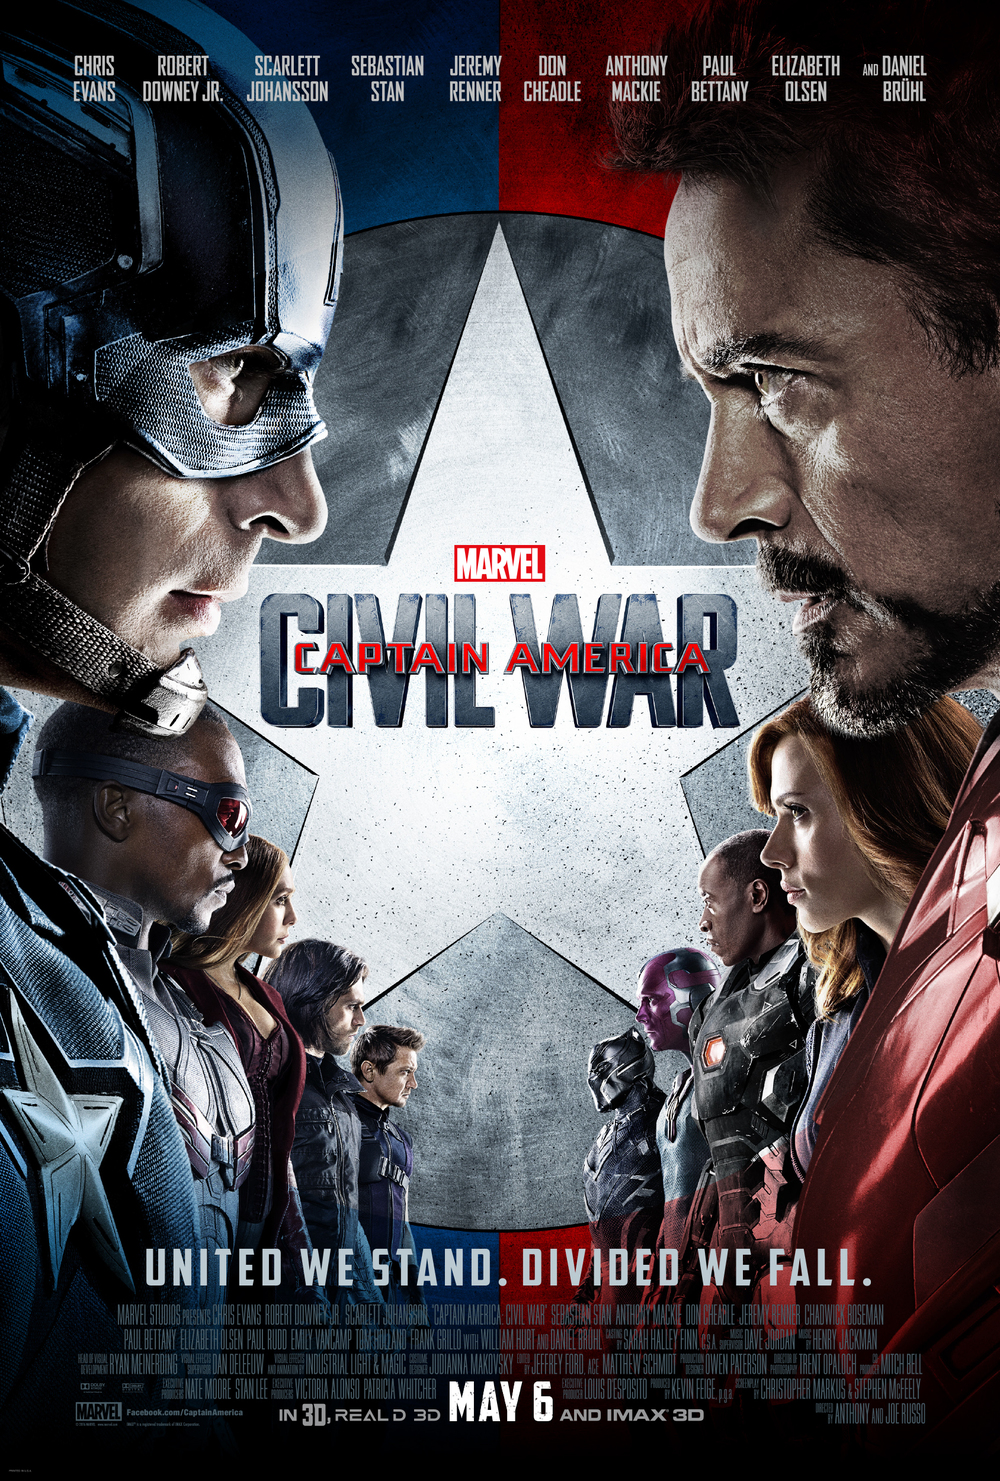 My Big Fat Cuban Family - Captain America: Civil War Review